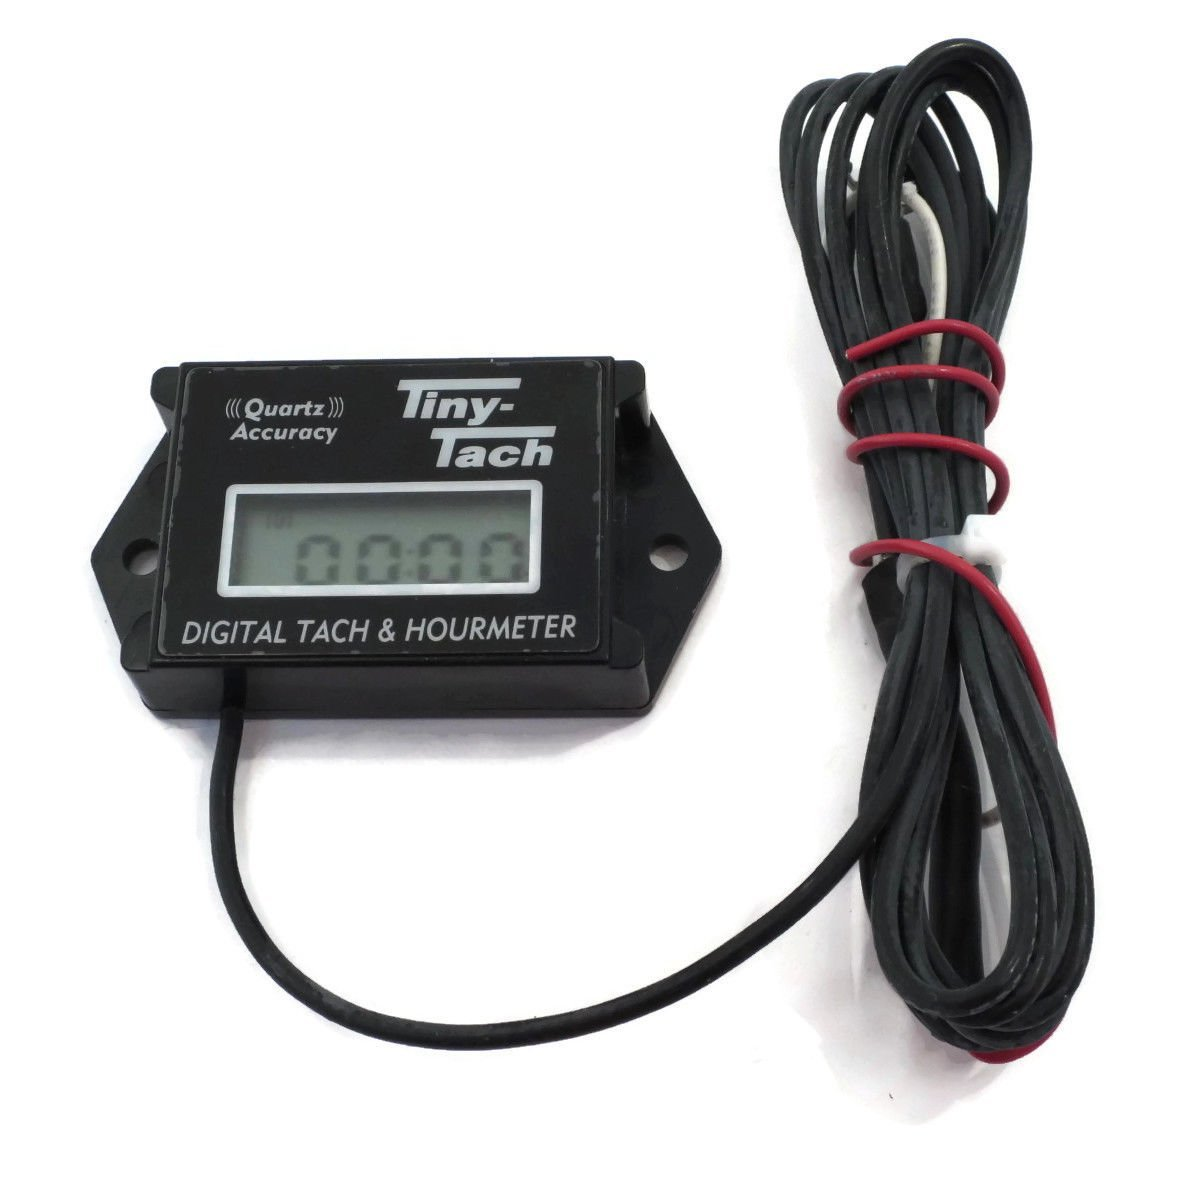 Tiny Tach DTI-CTT-11 Commercial Hour Meter Tachometer